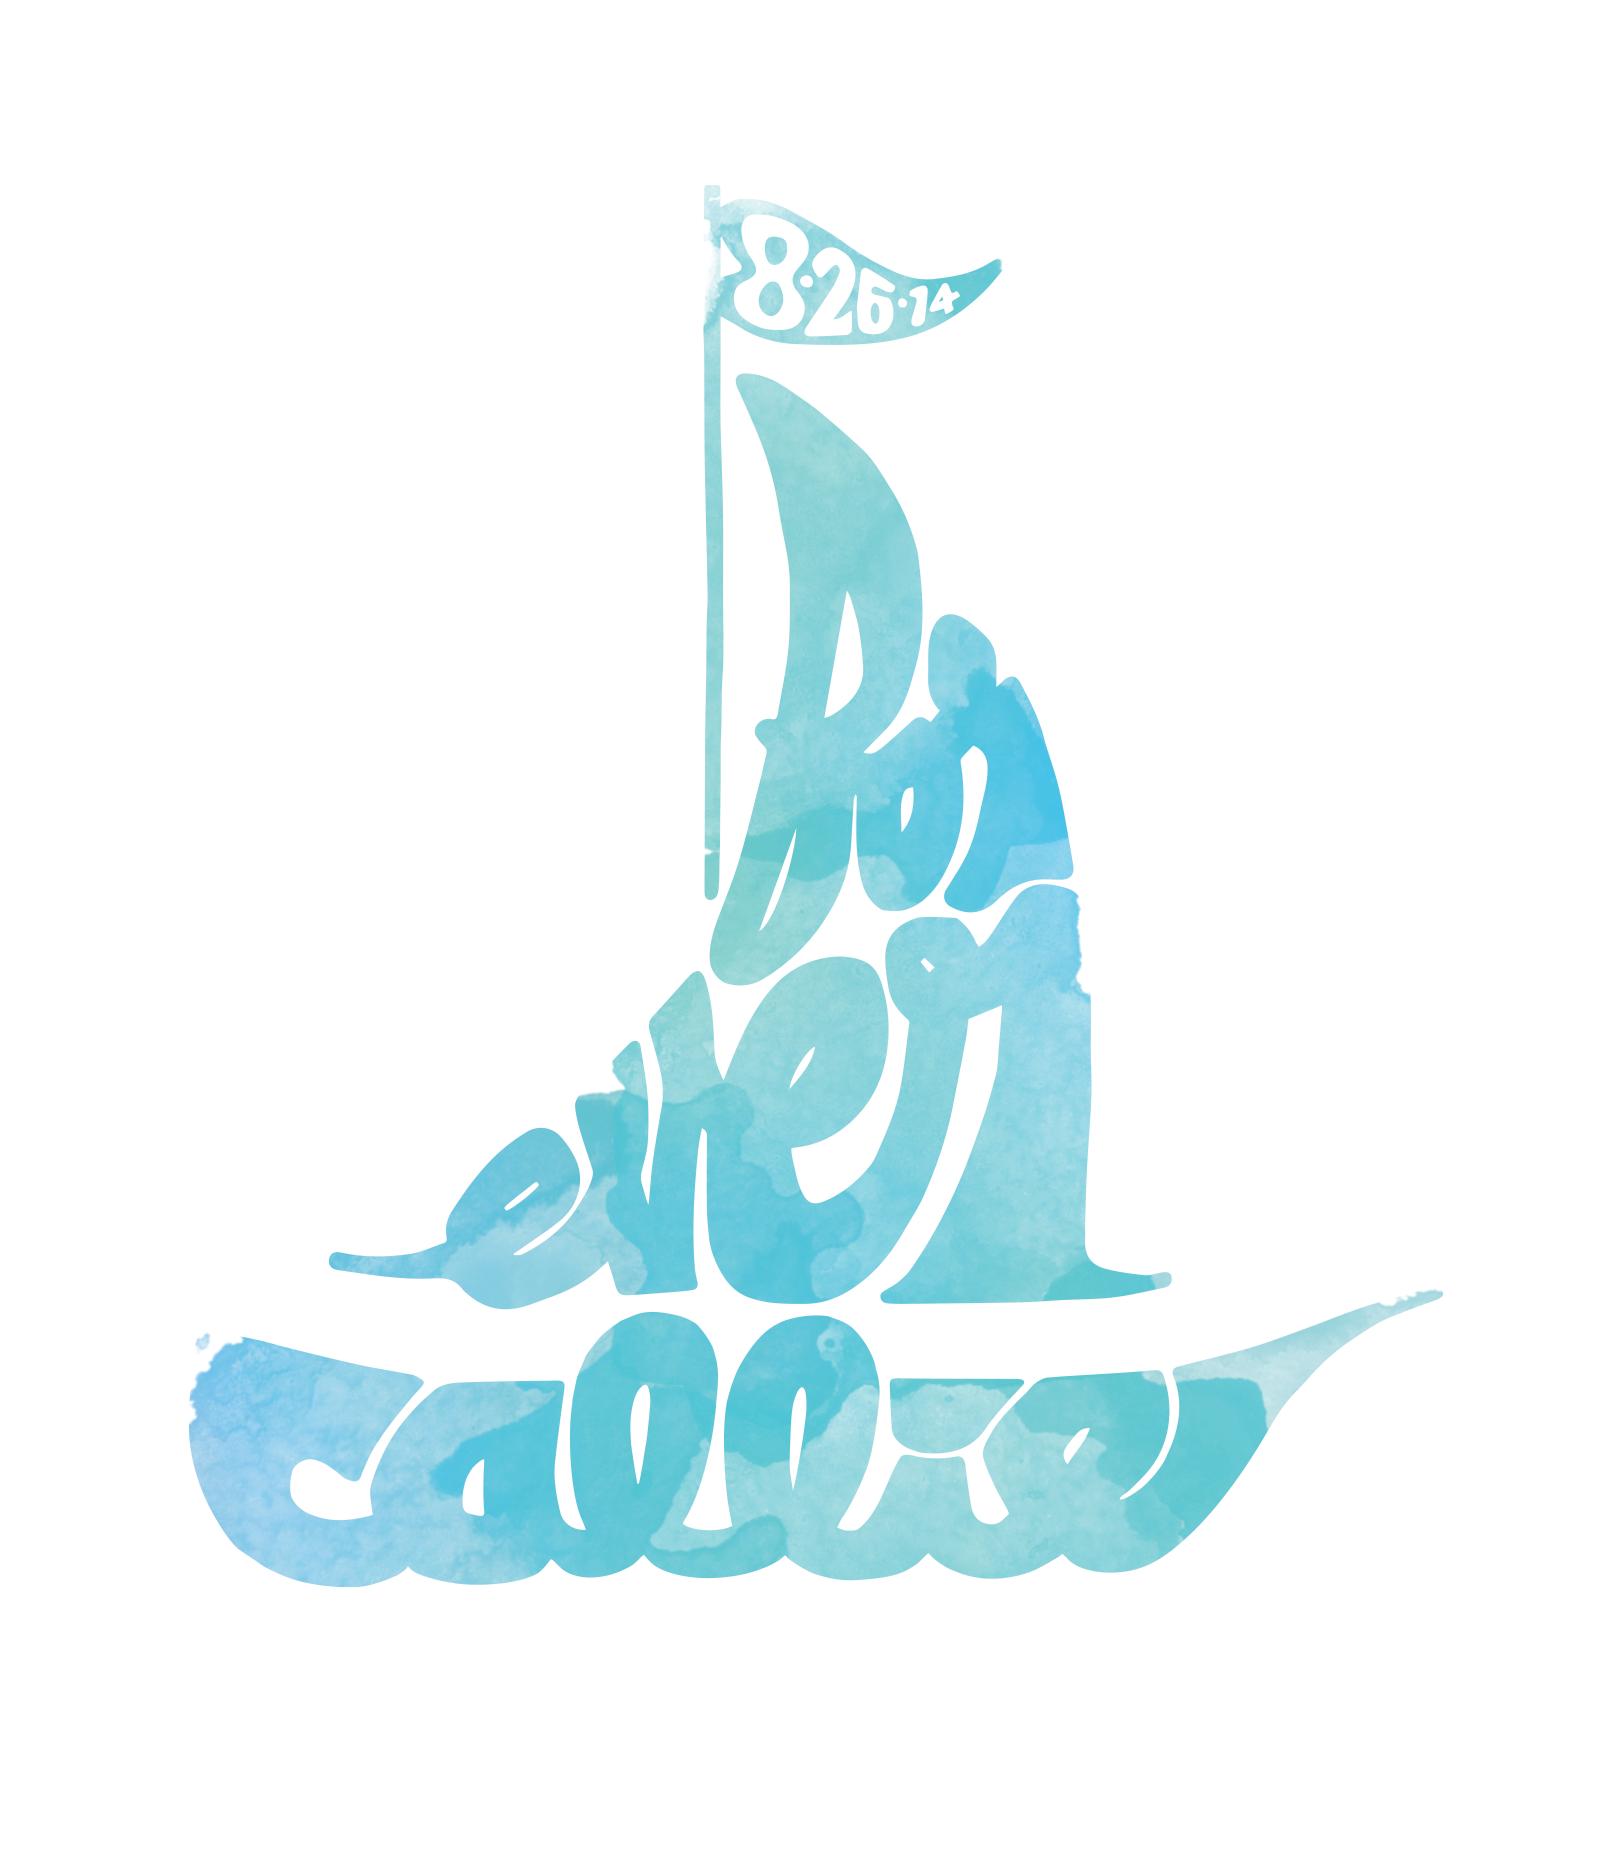 callie-watercolor1.png